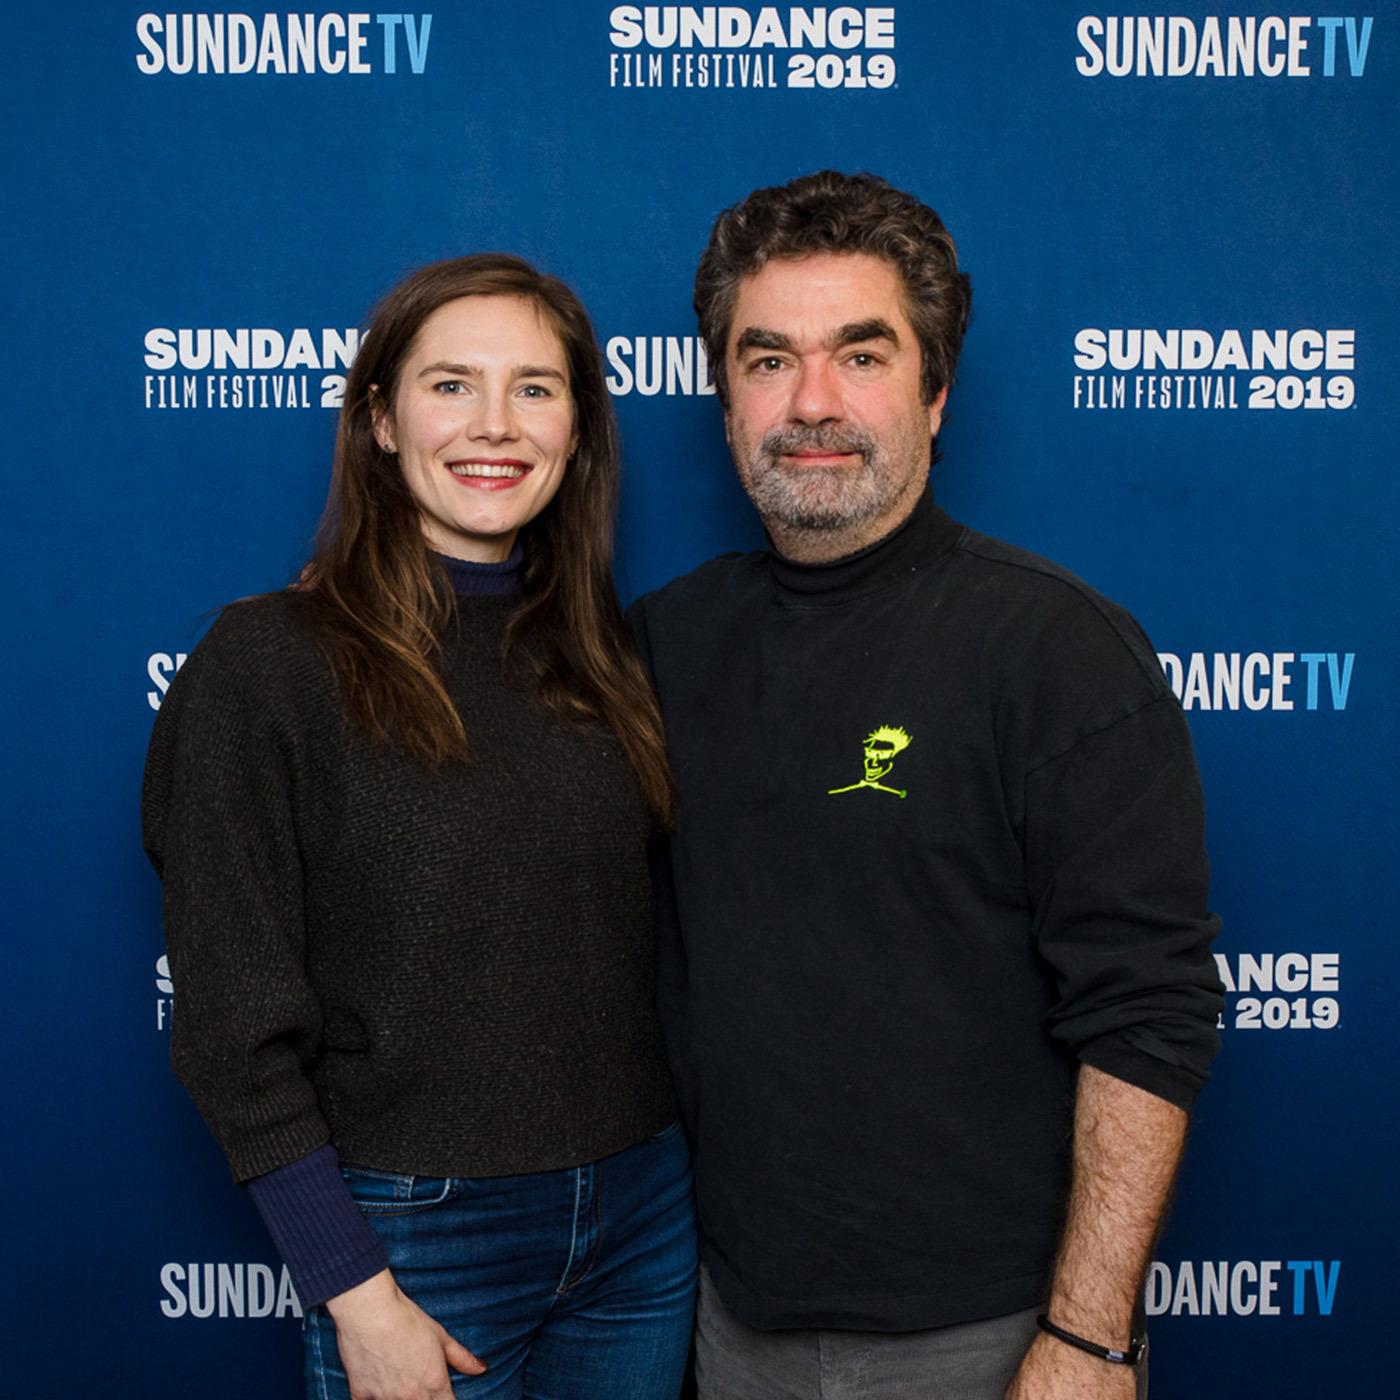 Sundance Film Festival Bonus Episode: Filmmaker Joe Berlinger (Extremely Wicked, Shockingly Evil and Vile)